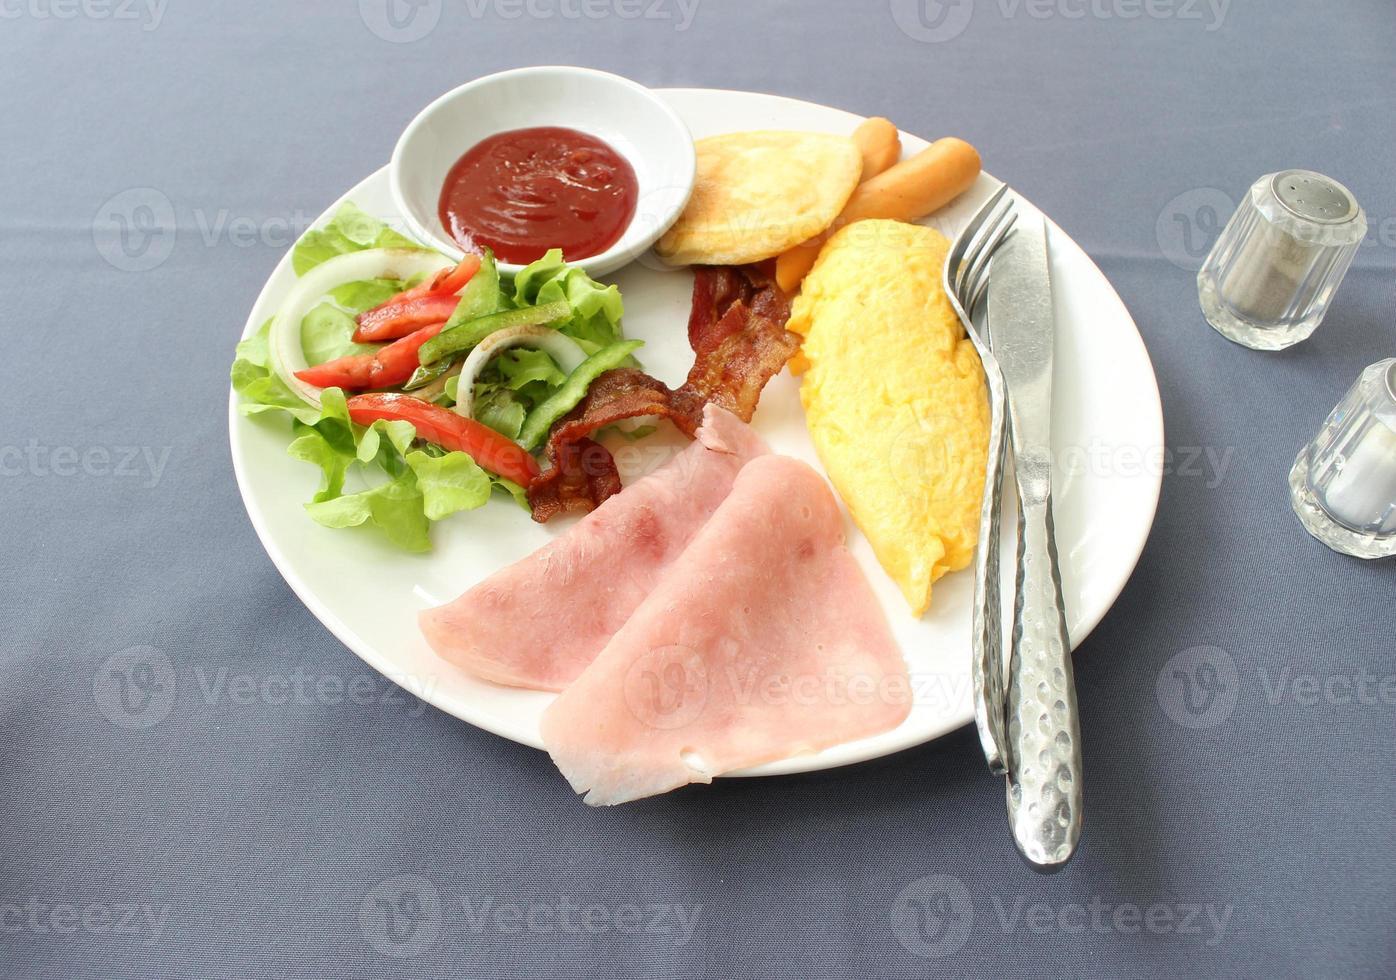 Plate of breakfast photo